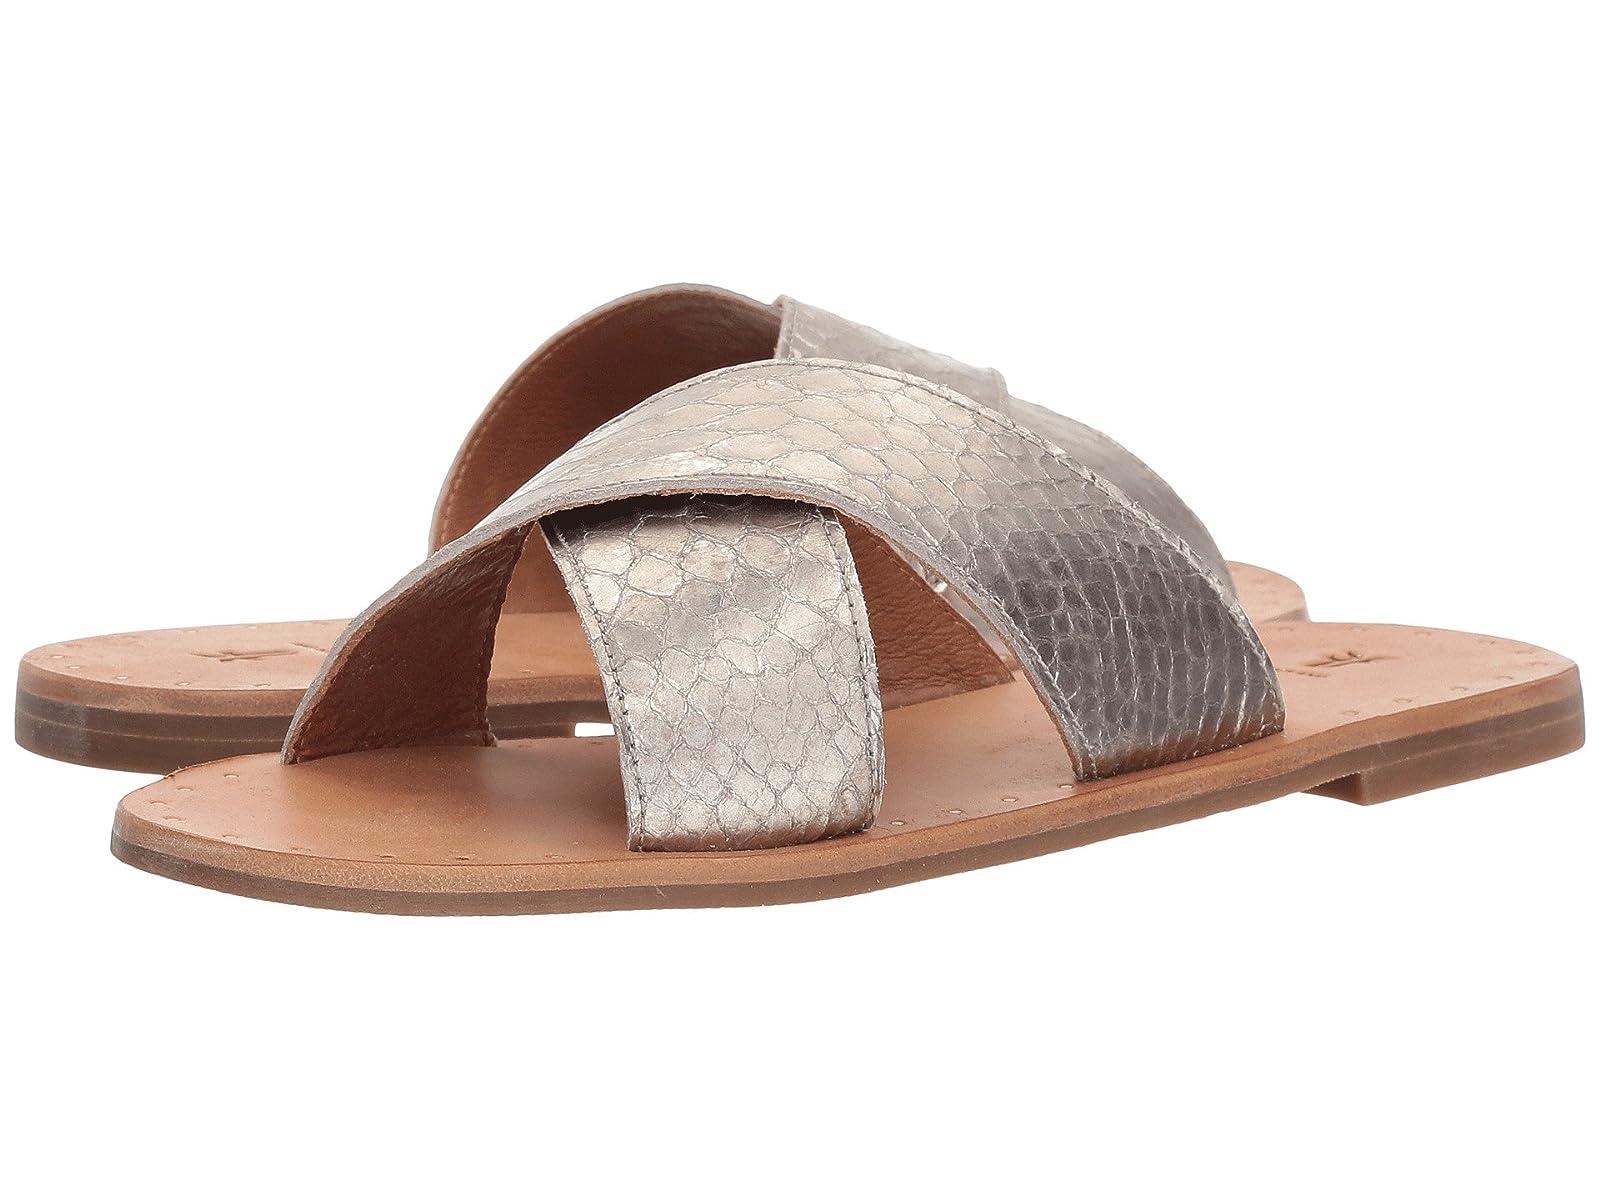 Frye Ally CrisscrossAtmospheric grades have affordable shoes